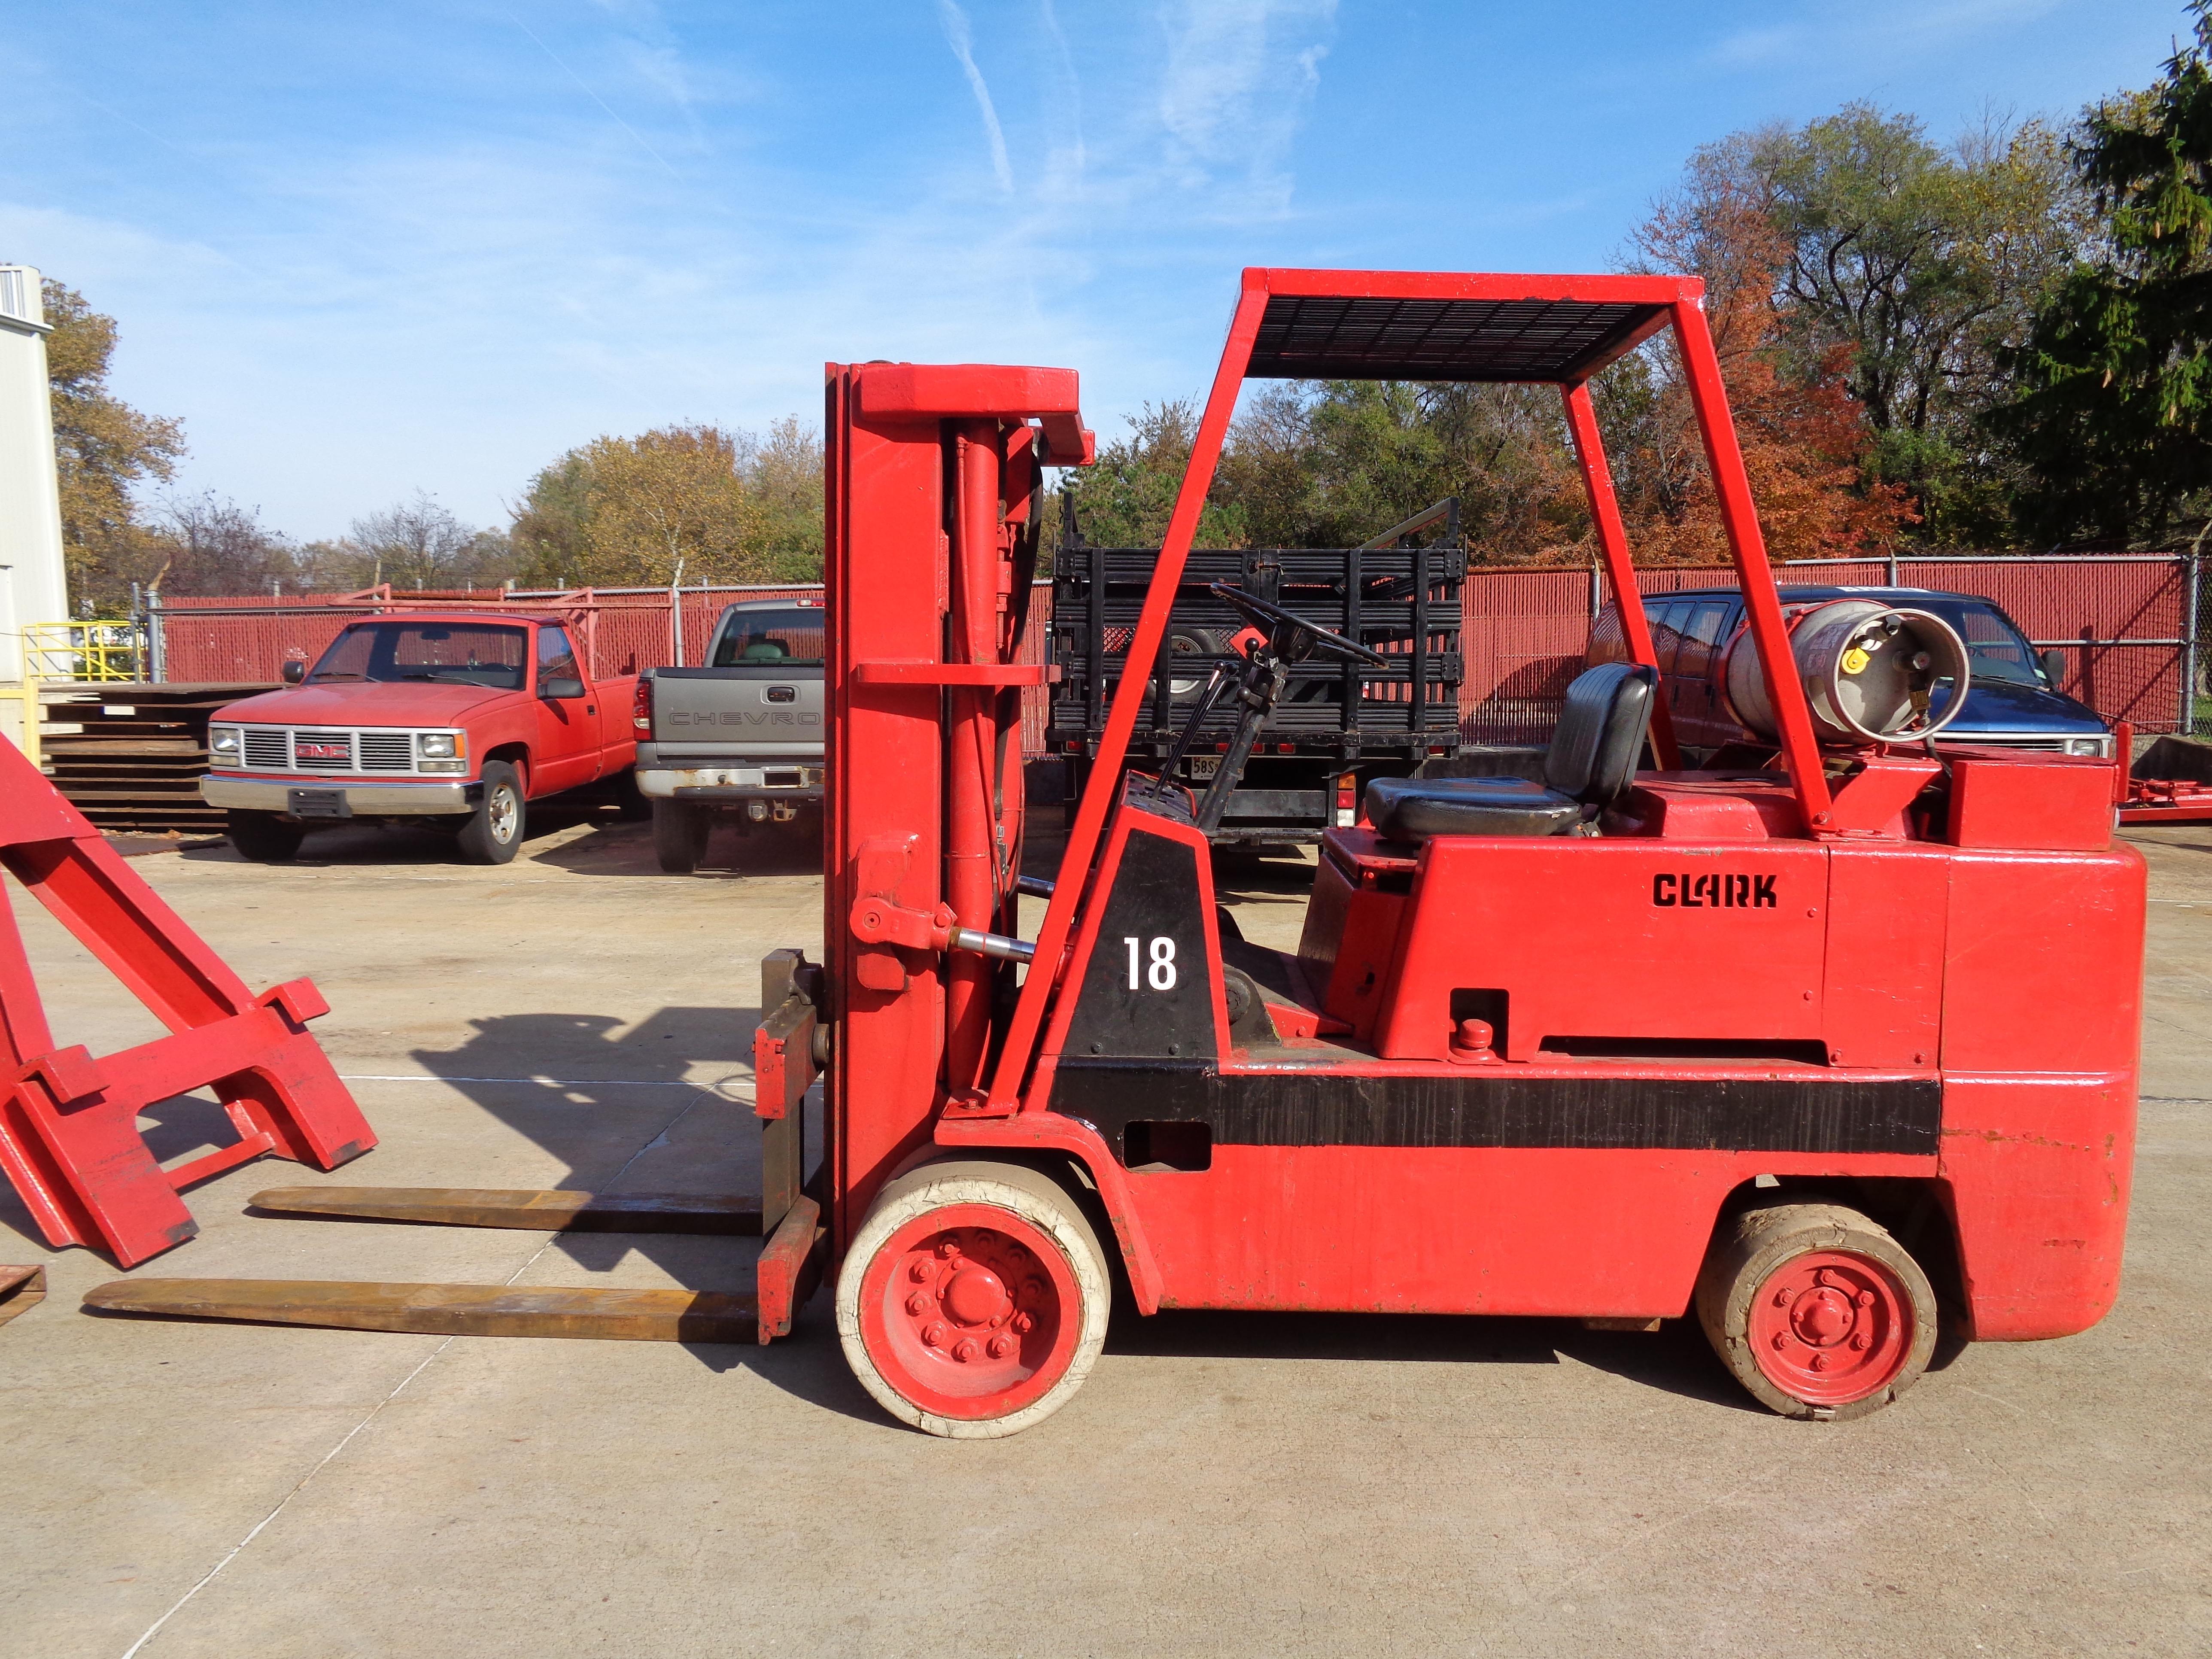 Clark C500-135 Forklift plus Boom- 14,000 lbs